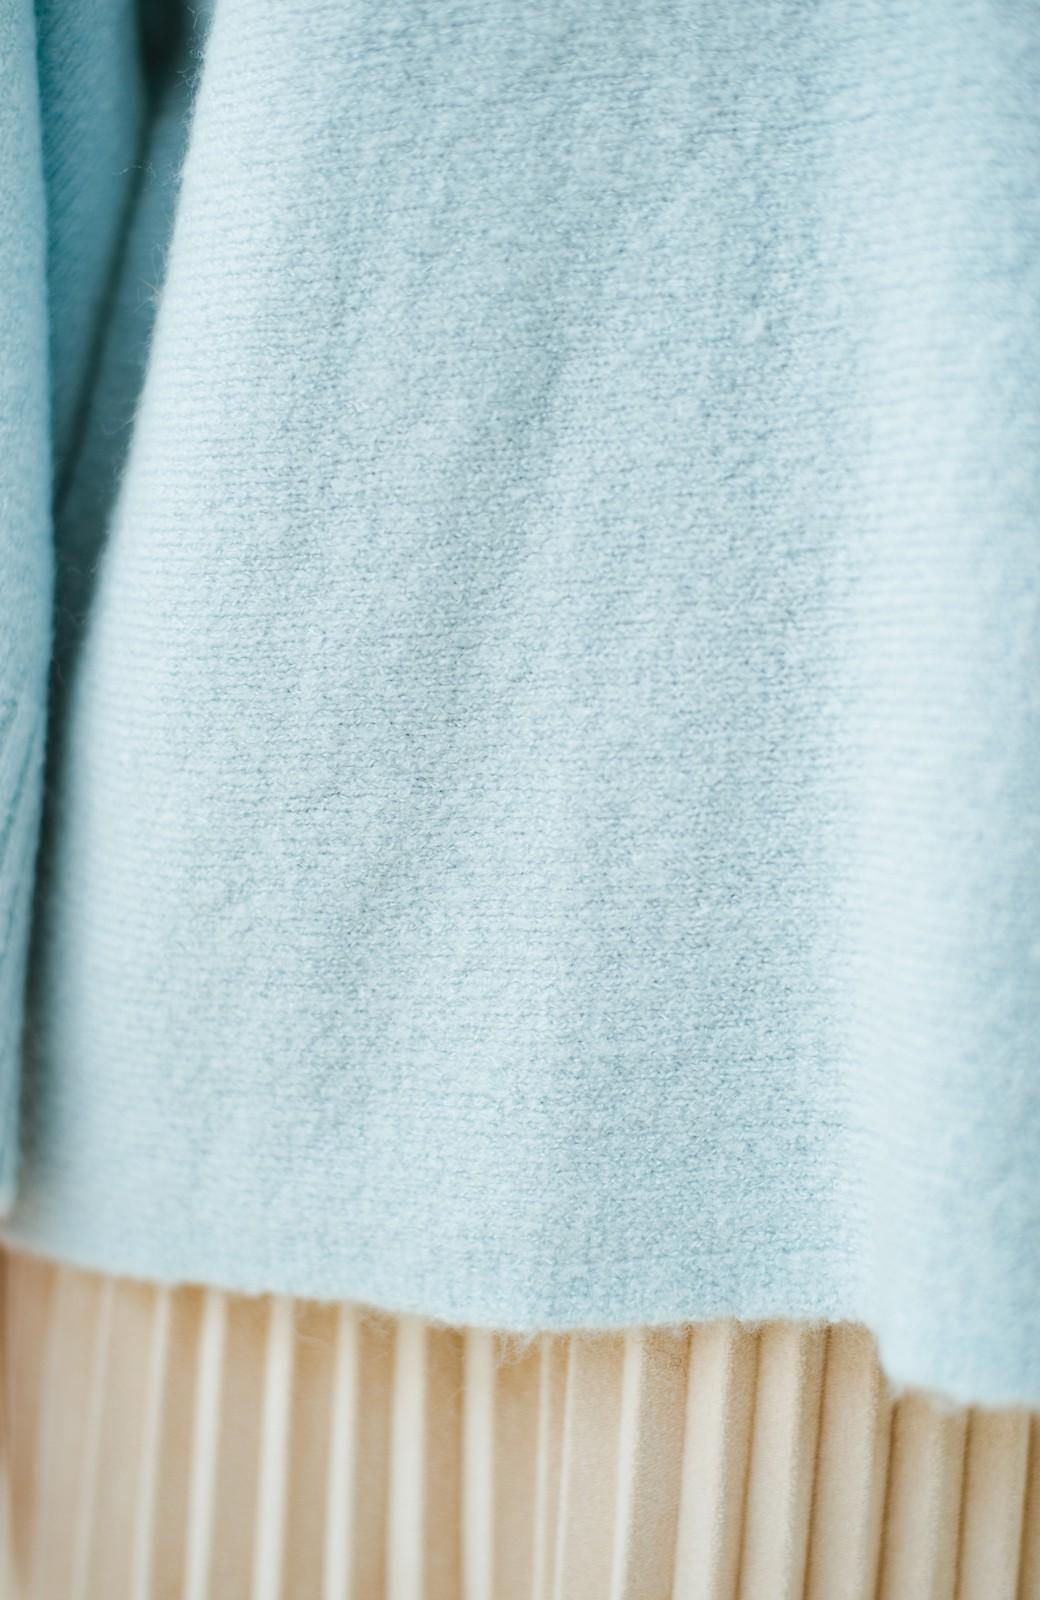 haco! 太め袖がかわいい横編みプルオーバーニット <ライトブルー>の商品写真7